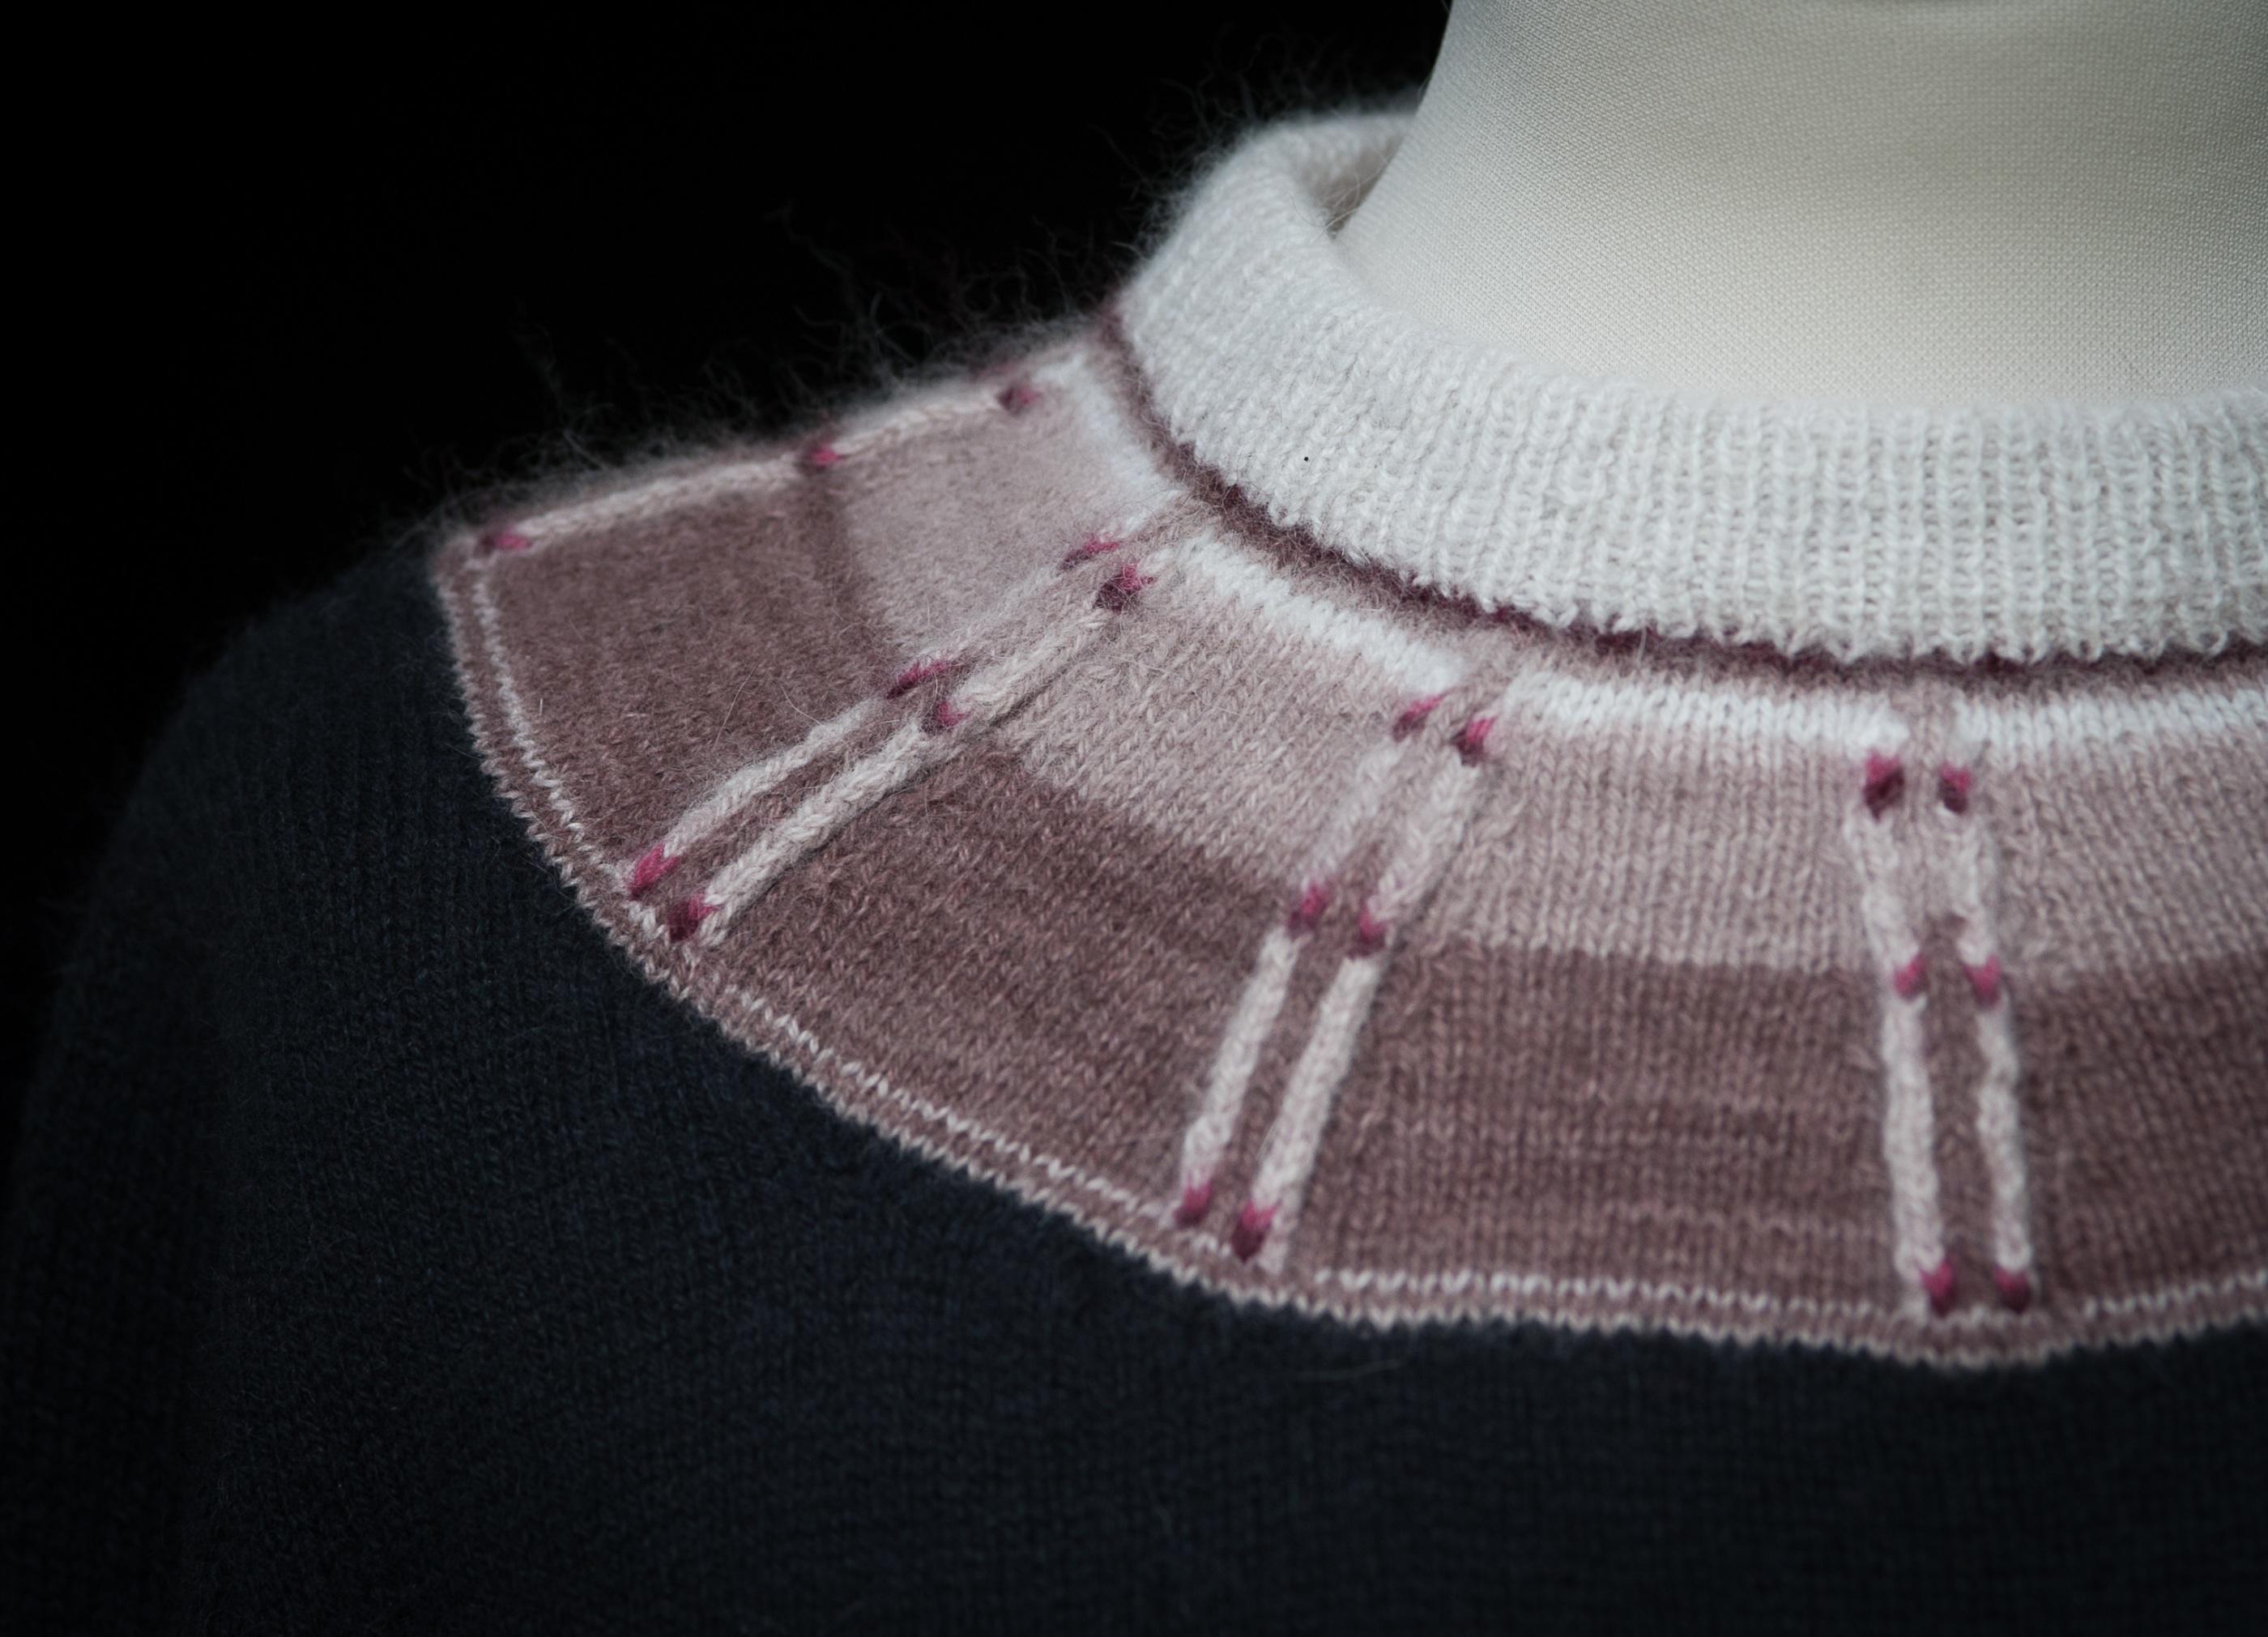 Bohus Stickning Rådjurspåret Red pullover, foto Karin Björk